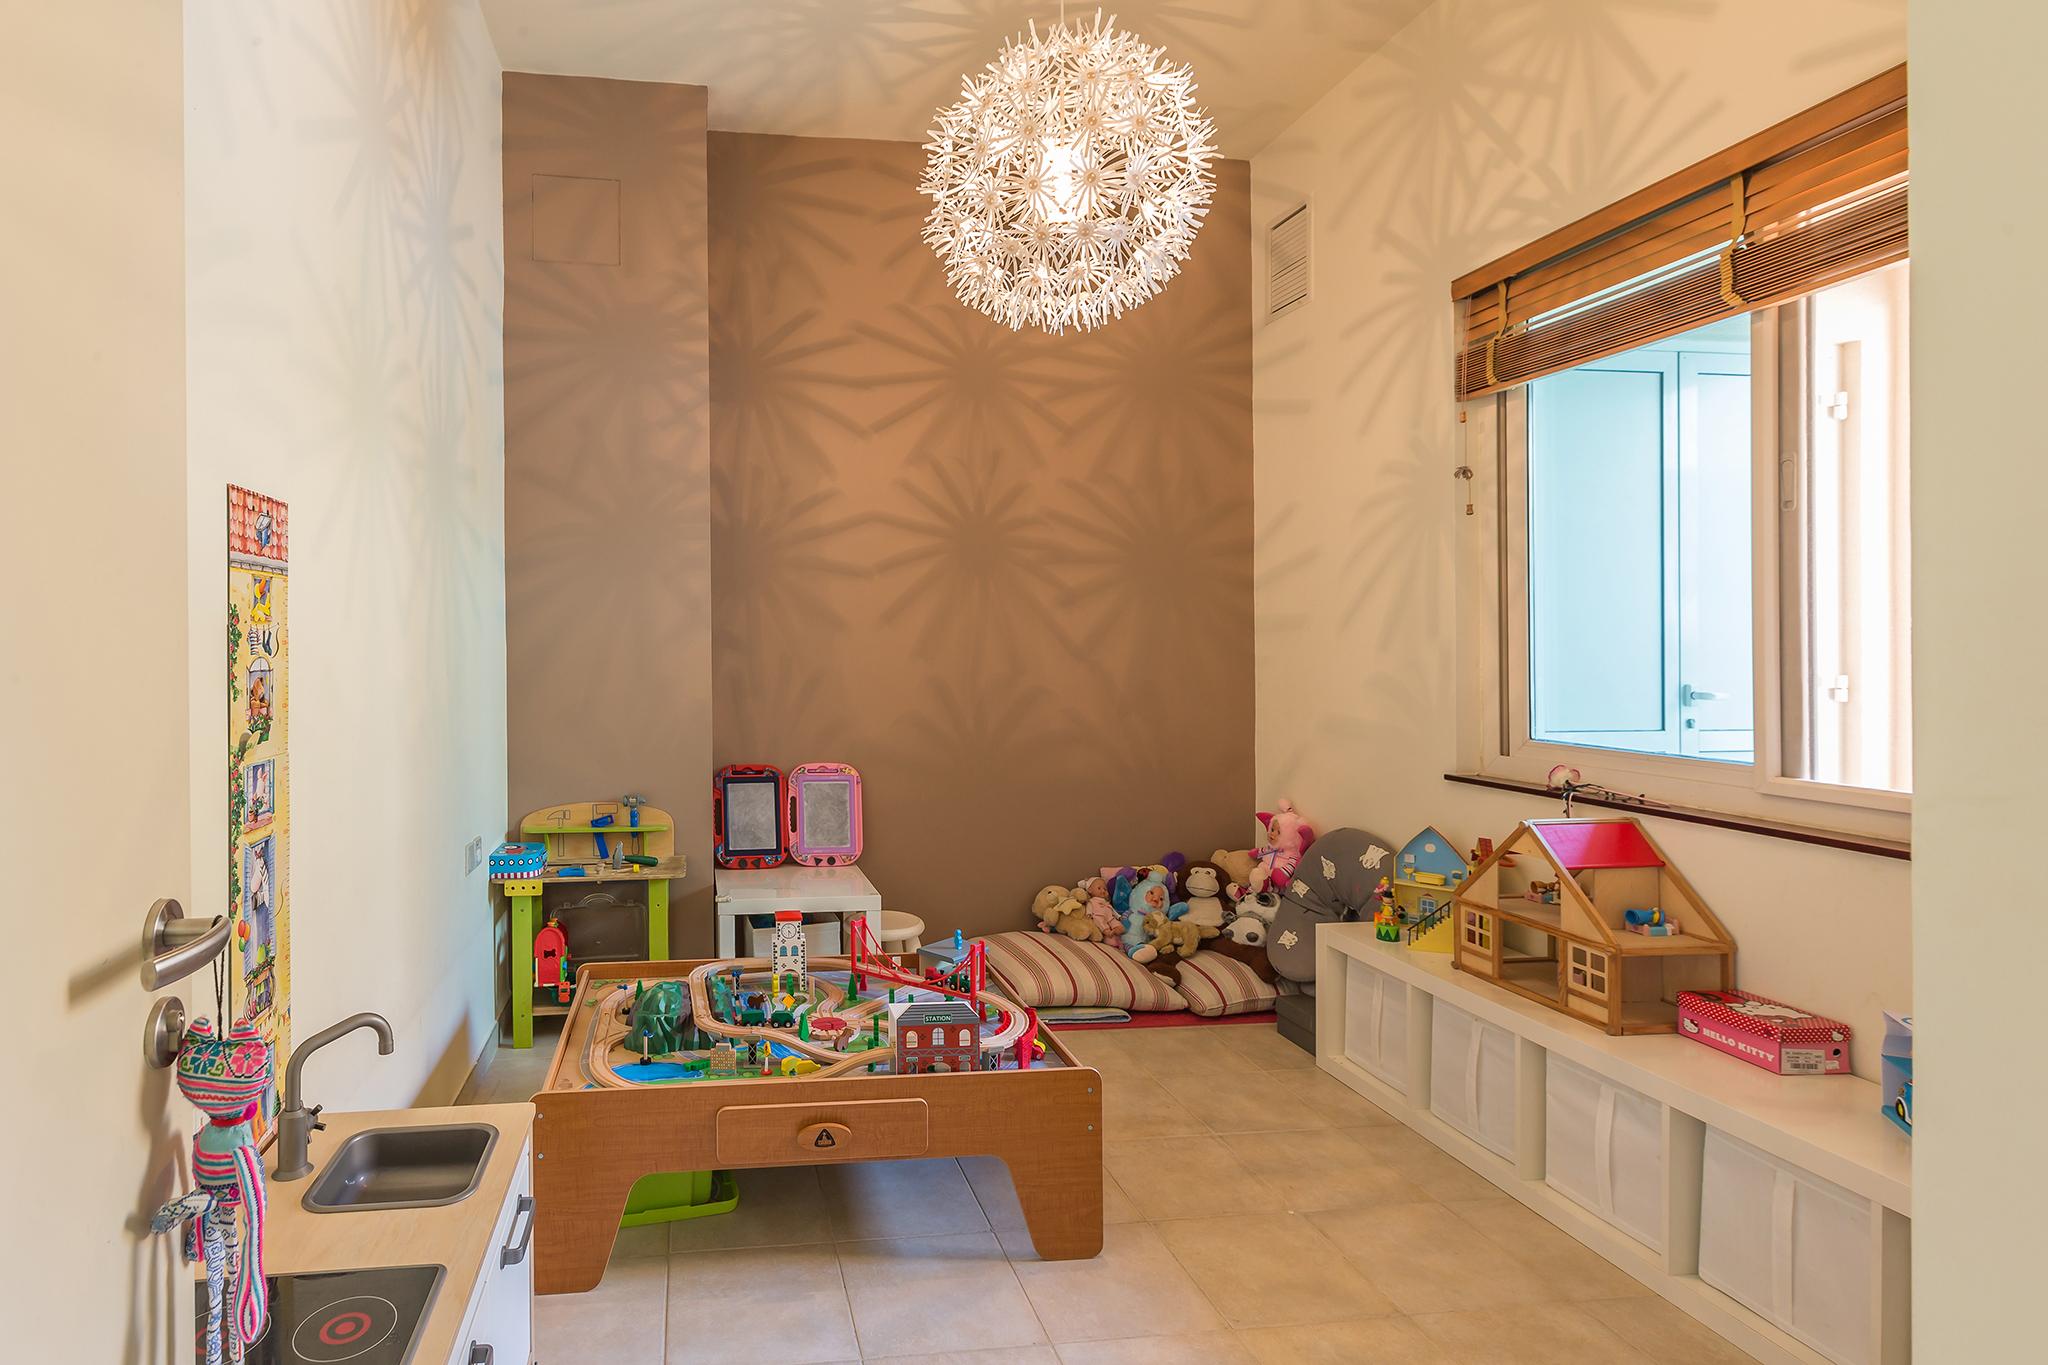 Kids will enjoy in this children's playroom